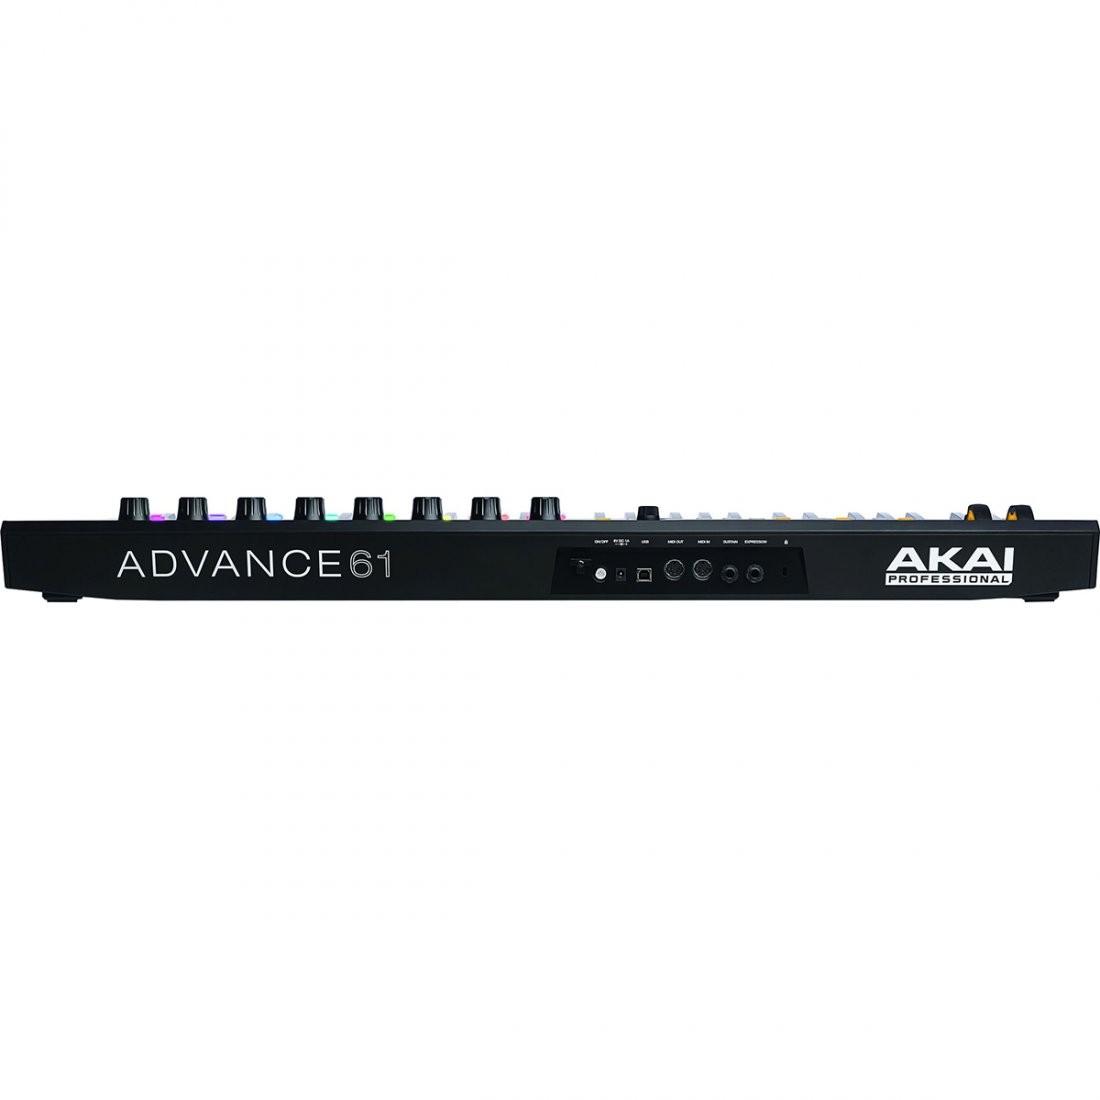 Akai Advance 61 Controladora Midi, 61 Teclas, 8 Pads, 8 Knobs, Usb, Bivolt